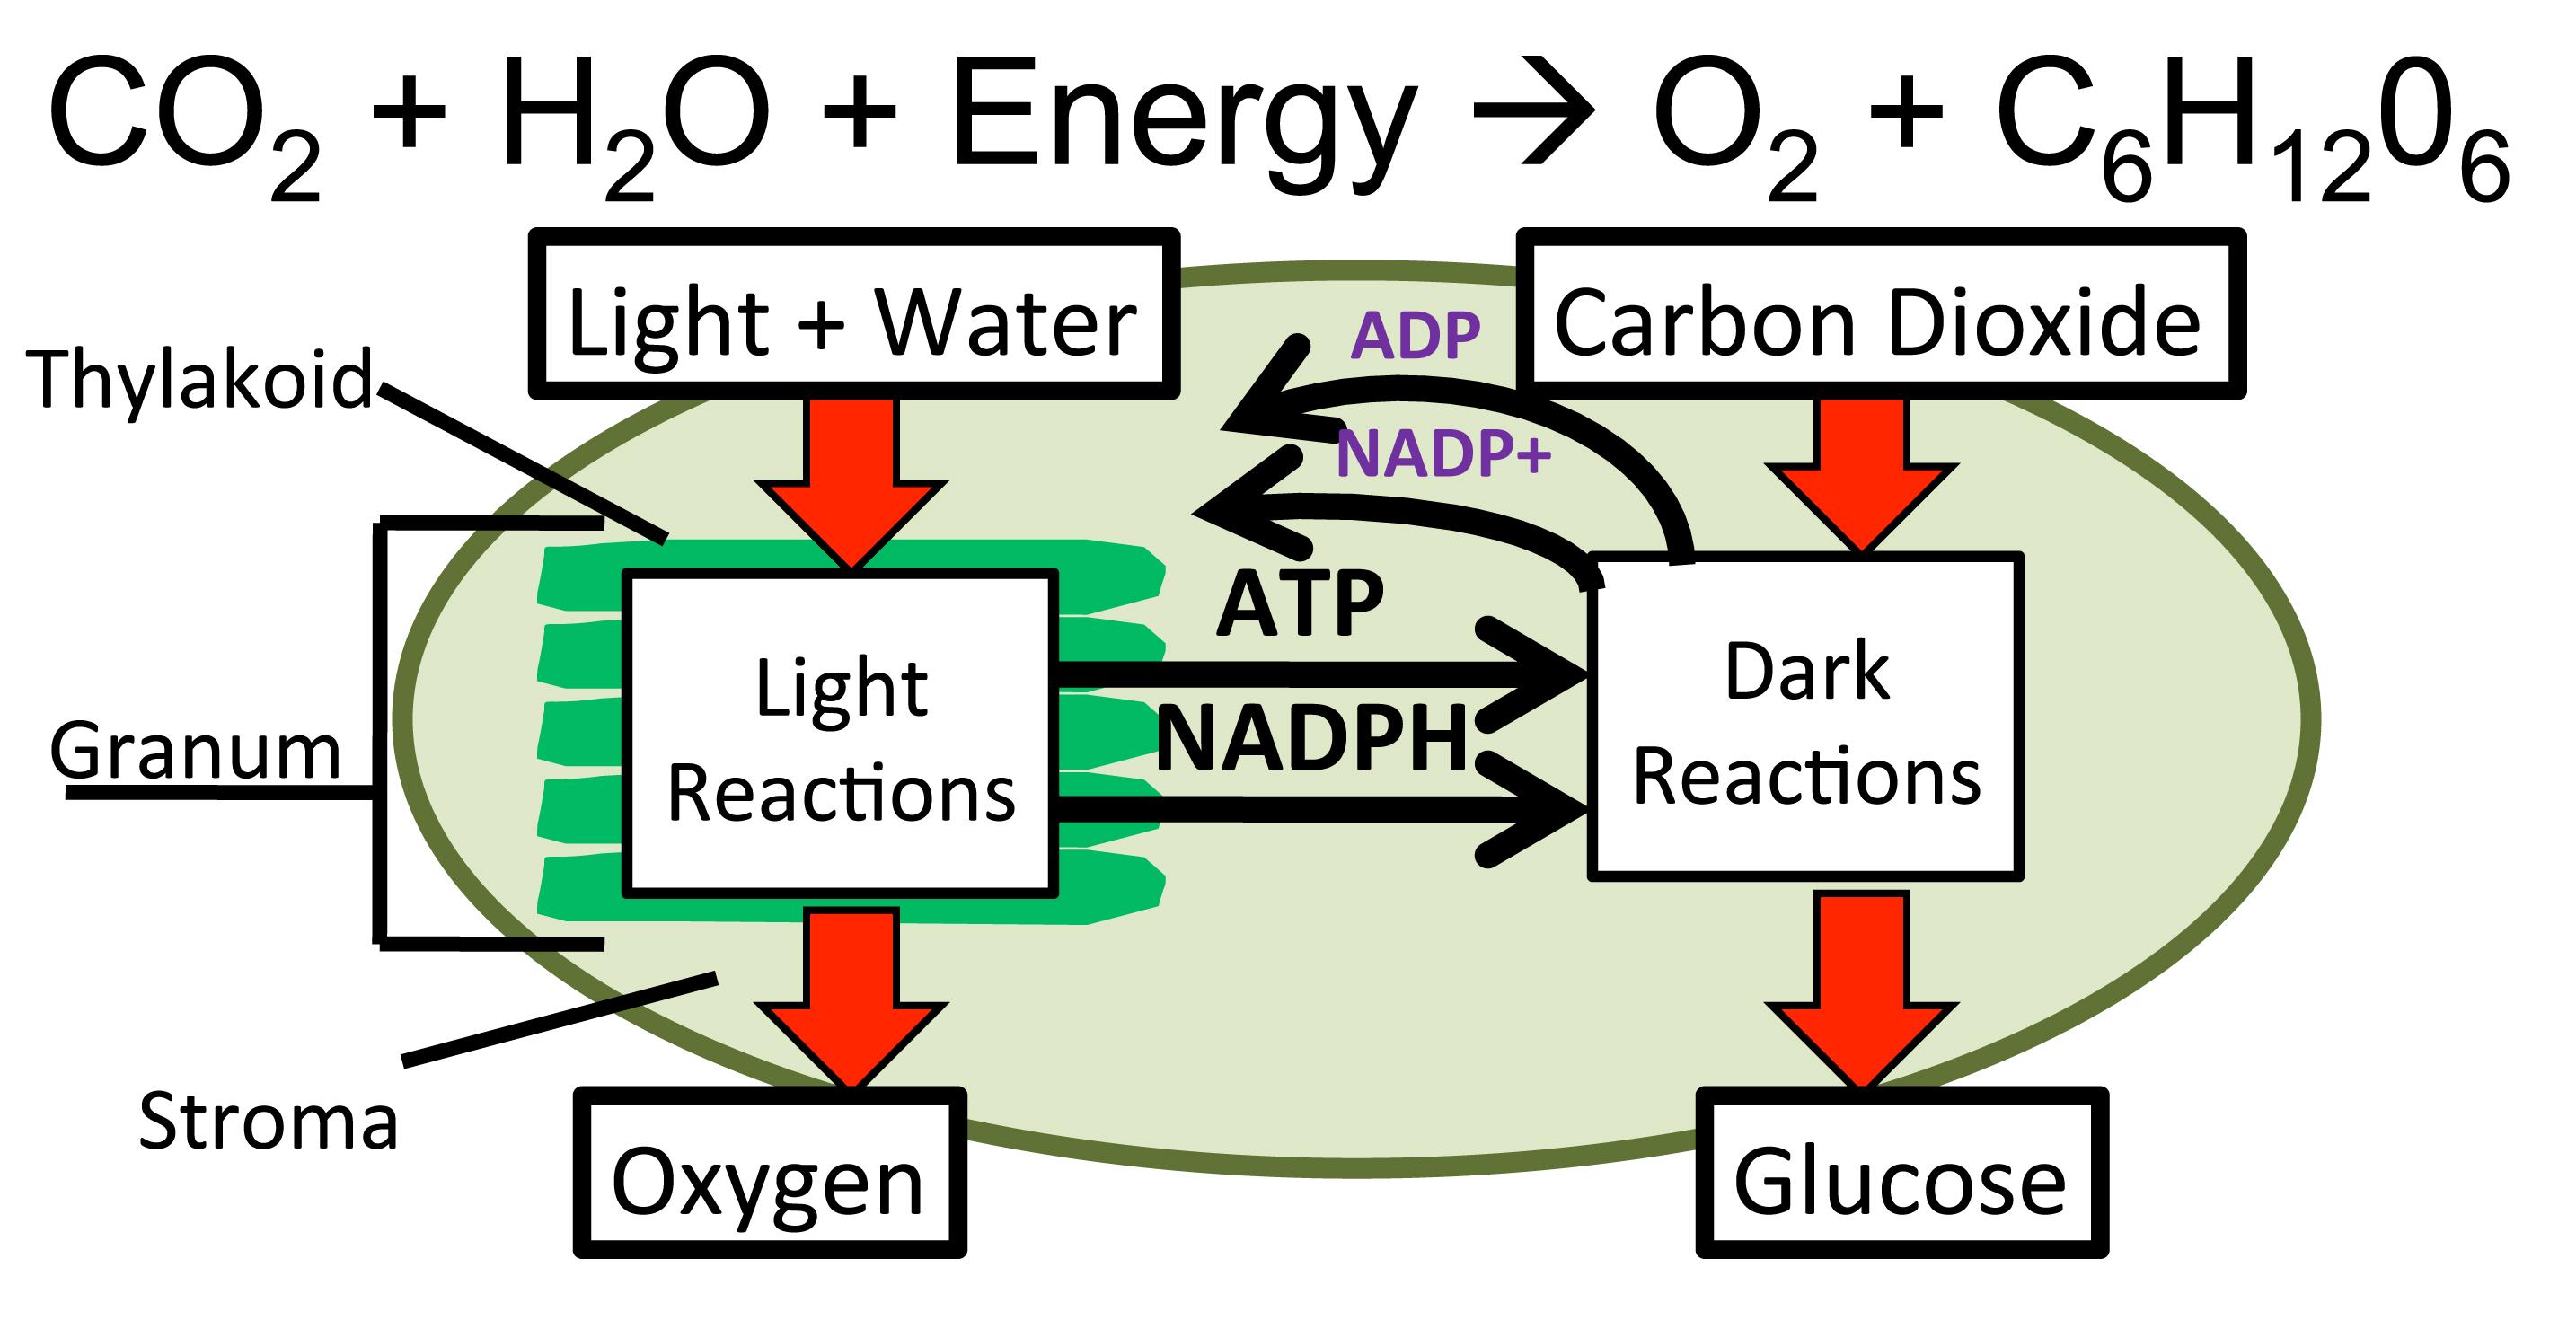 Dark Reactions Photosynthesisdaily